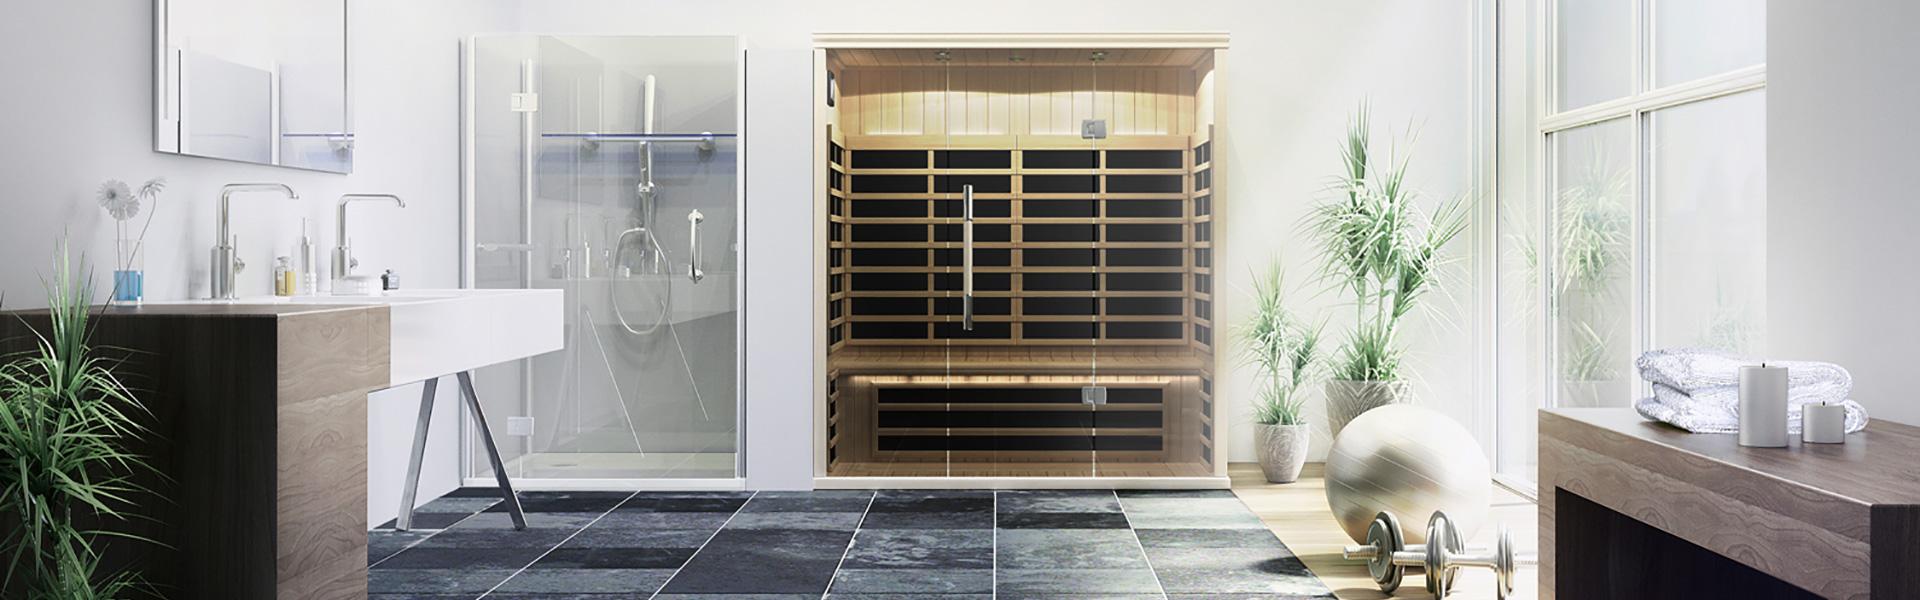 3 Healthy Benefits from Using a Sauna, Sauna Sale Clive